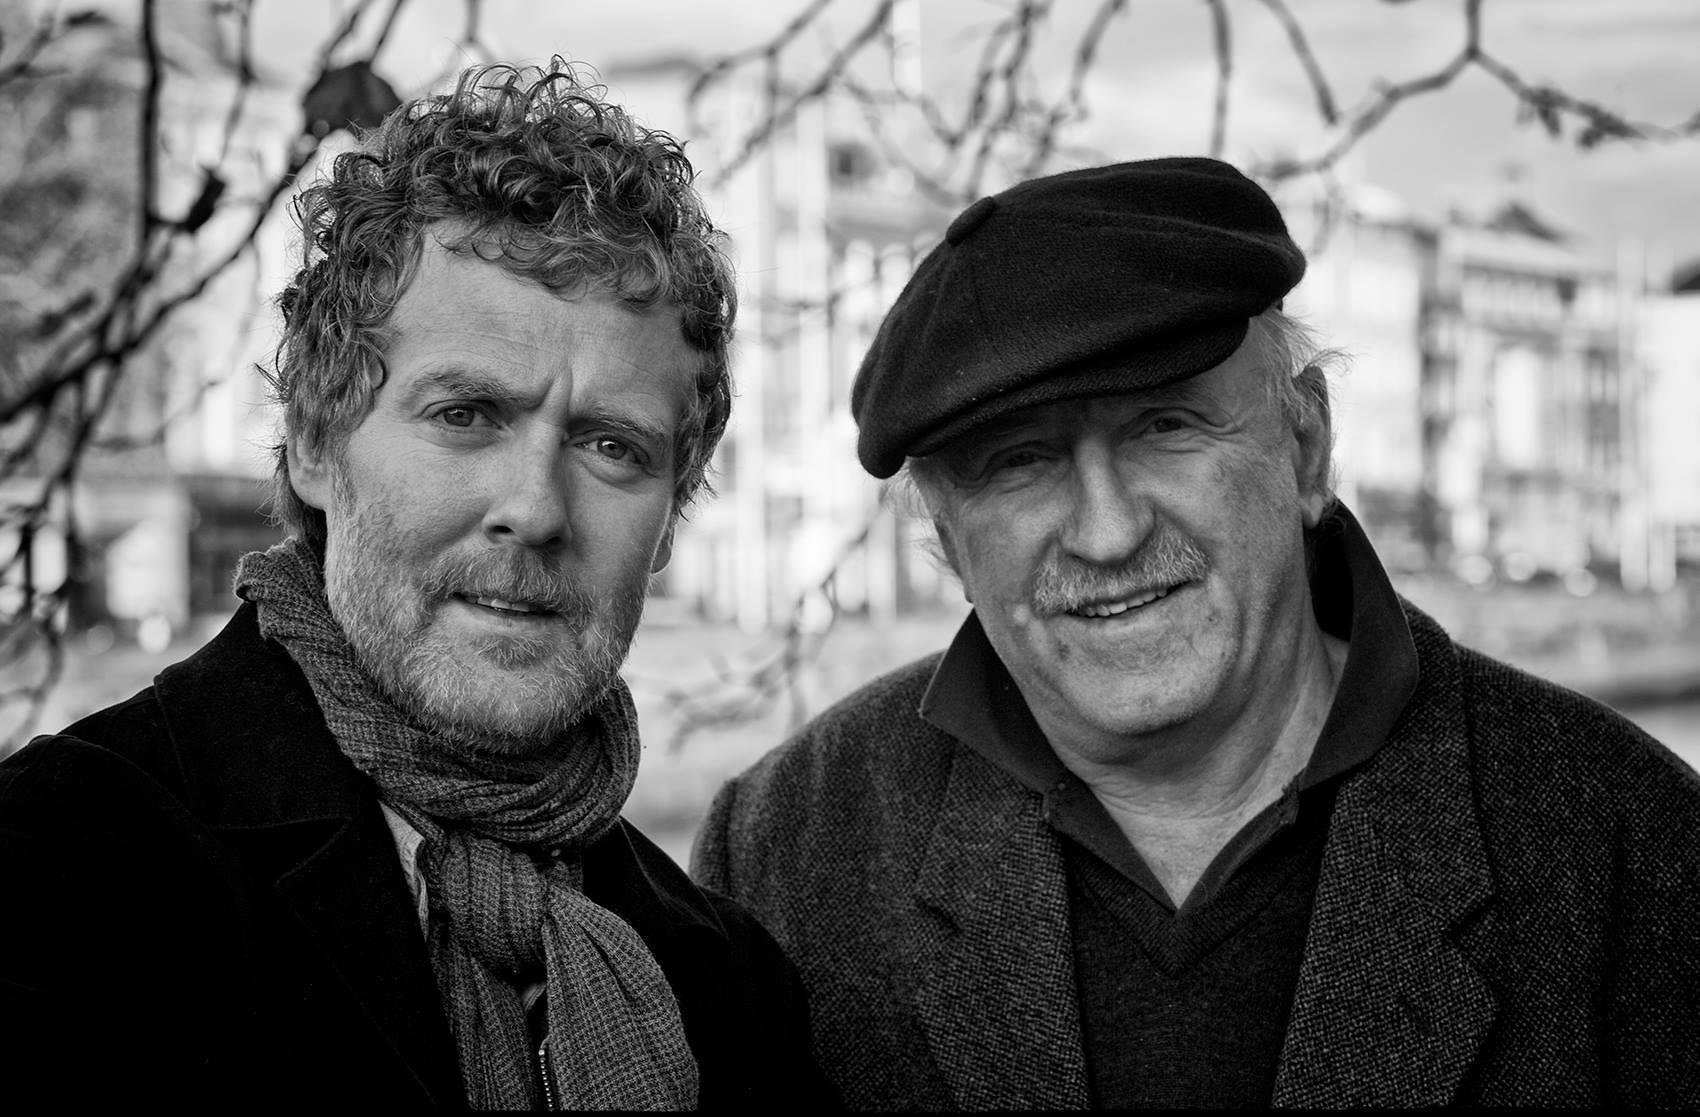 Glen & Ronan by desmcmahon5